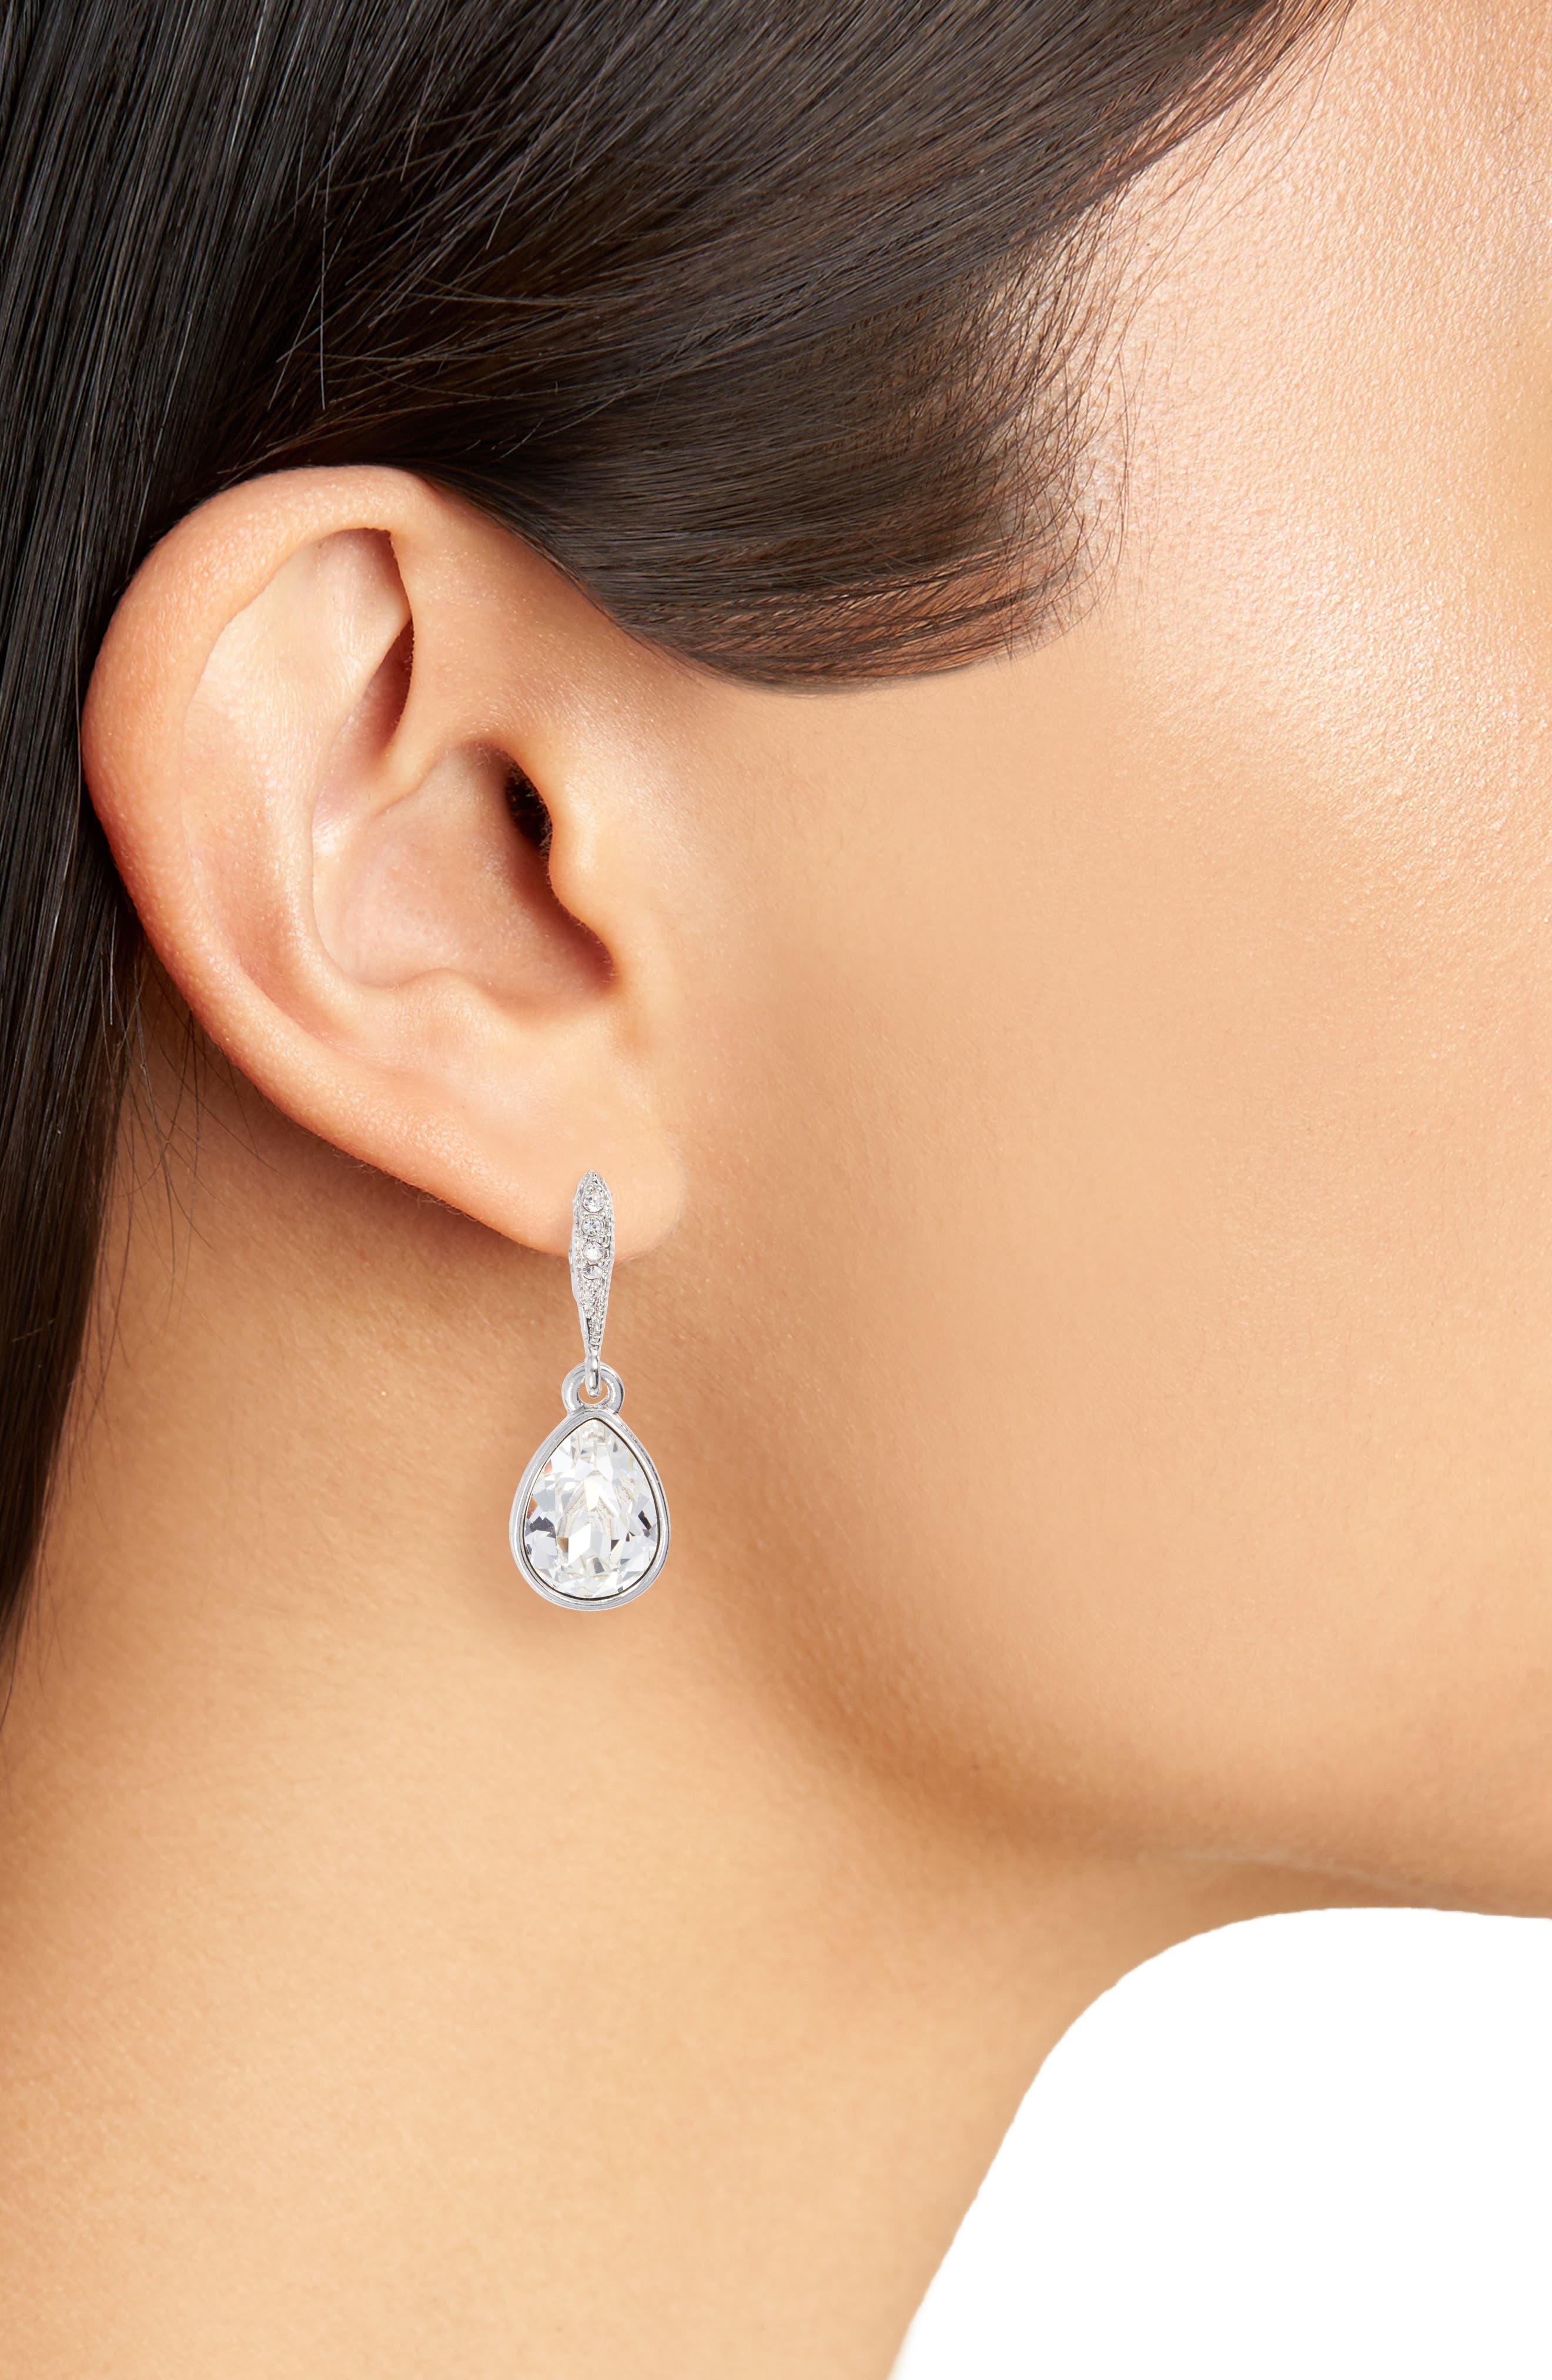 Small Drop Clip Earrings,                             Alternate thumbnail 2, color,                             040